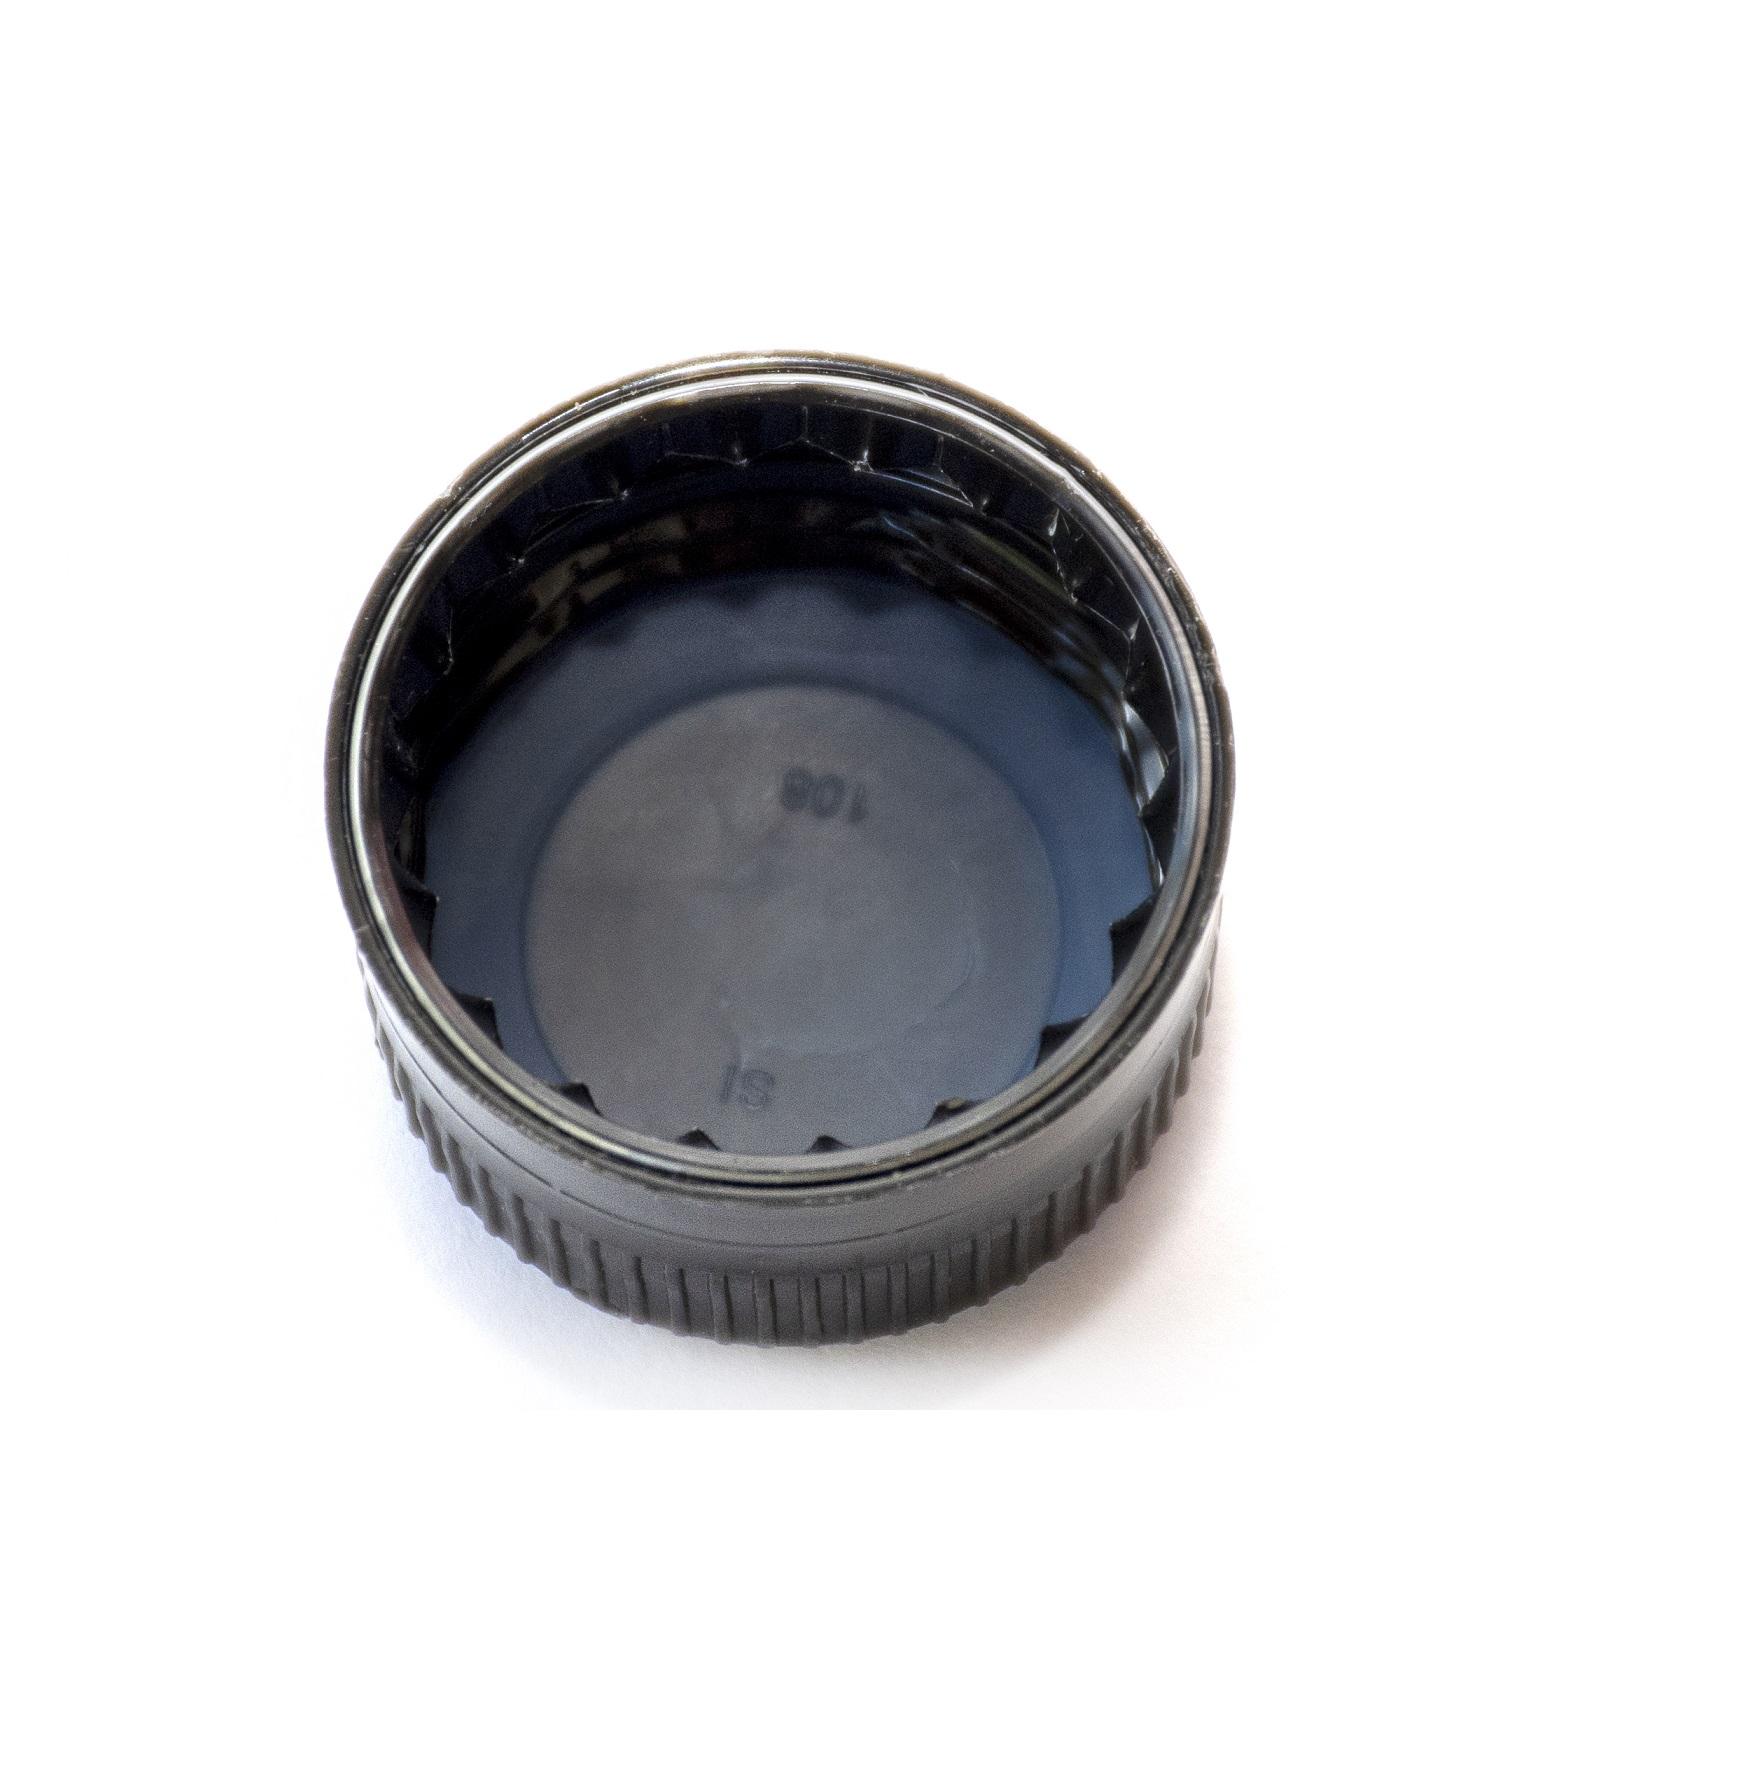 TAPA PLÁSTICA 28 mm ROSCA NEGRA